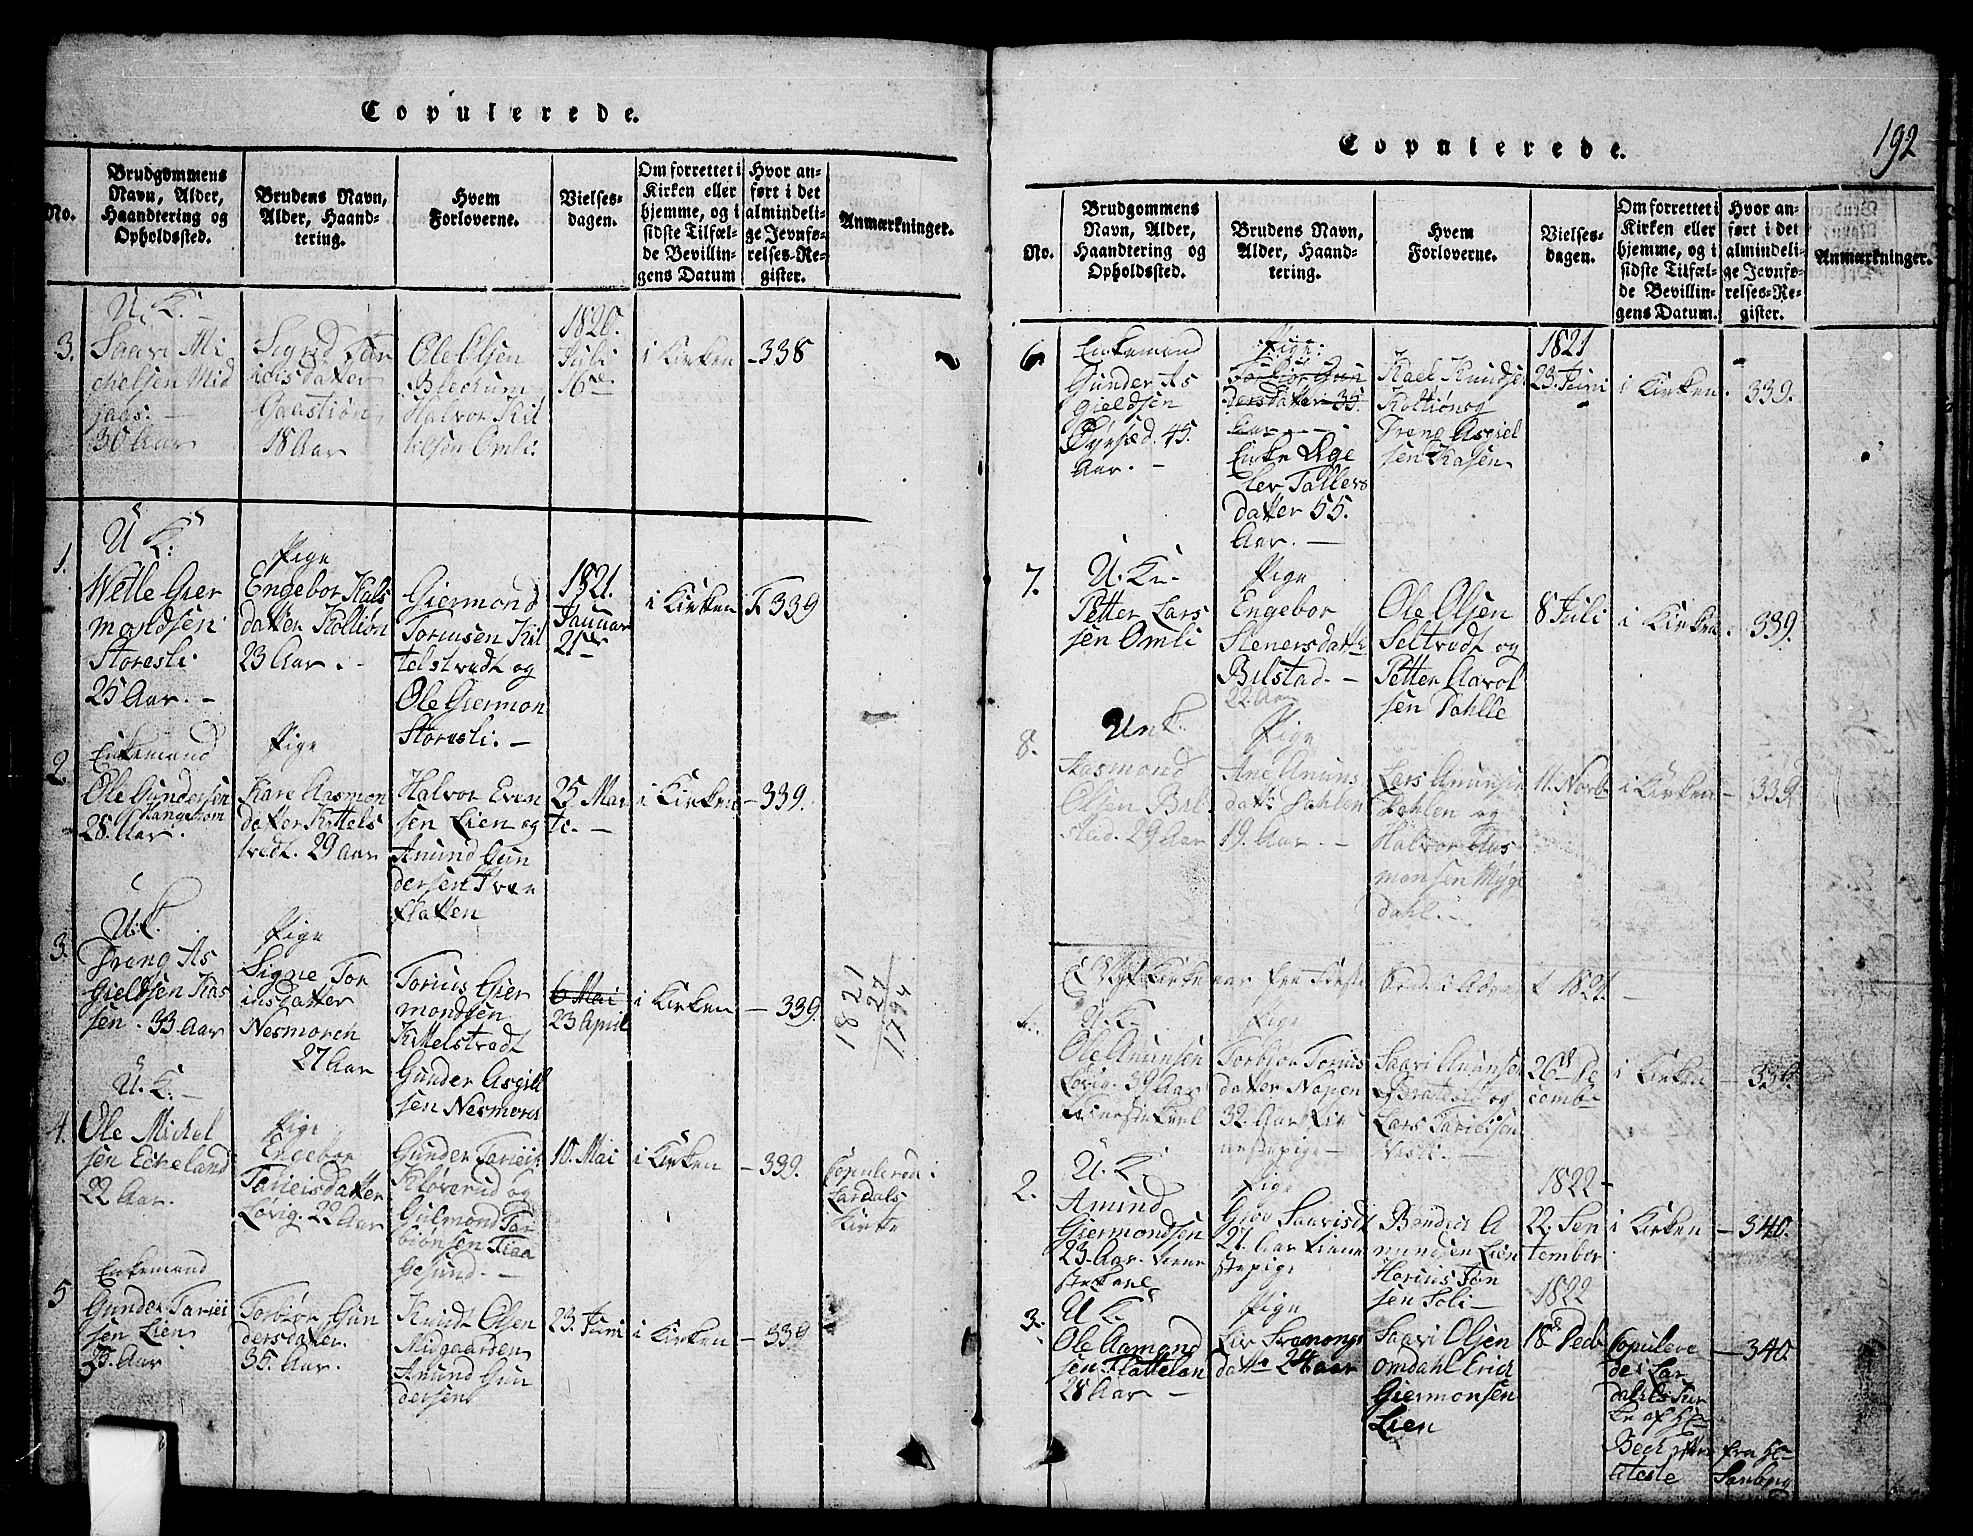 SAKO, Mo kirkebøker, G/Gb/L0001: Klokkerbok nr. II 1, 1814-1843, s. 192